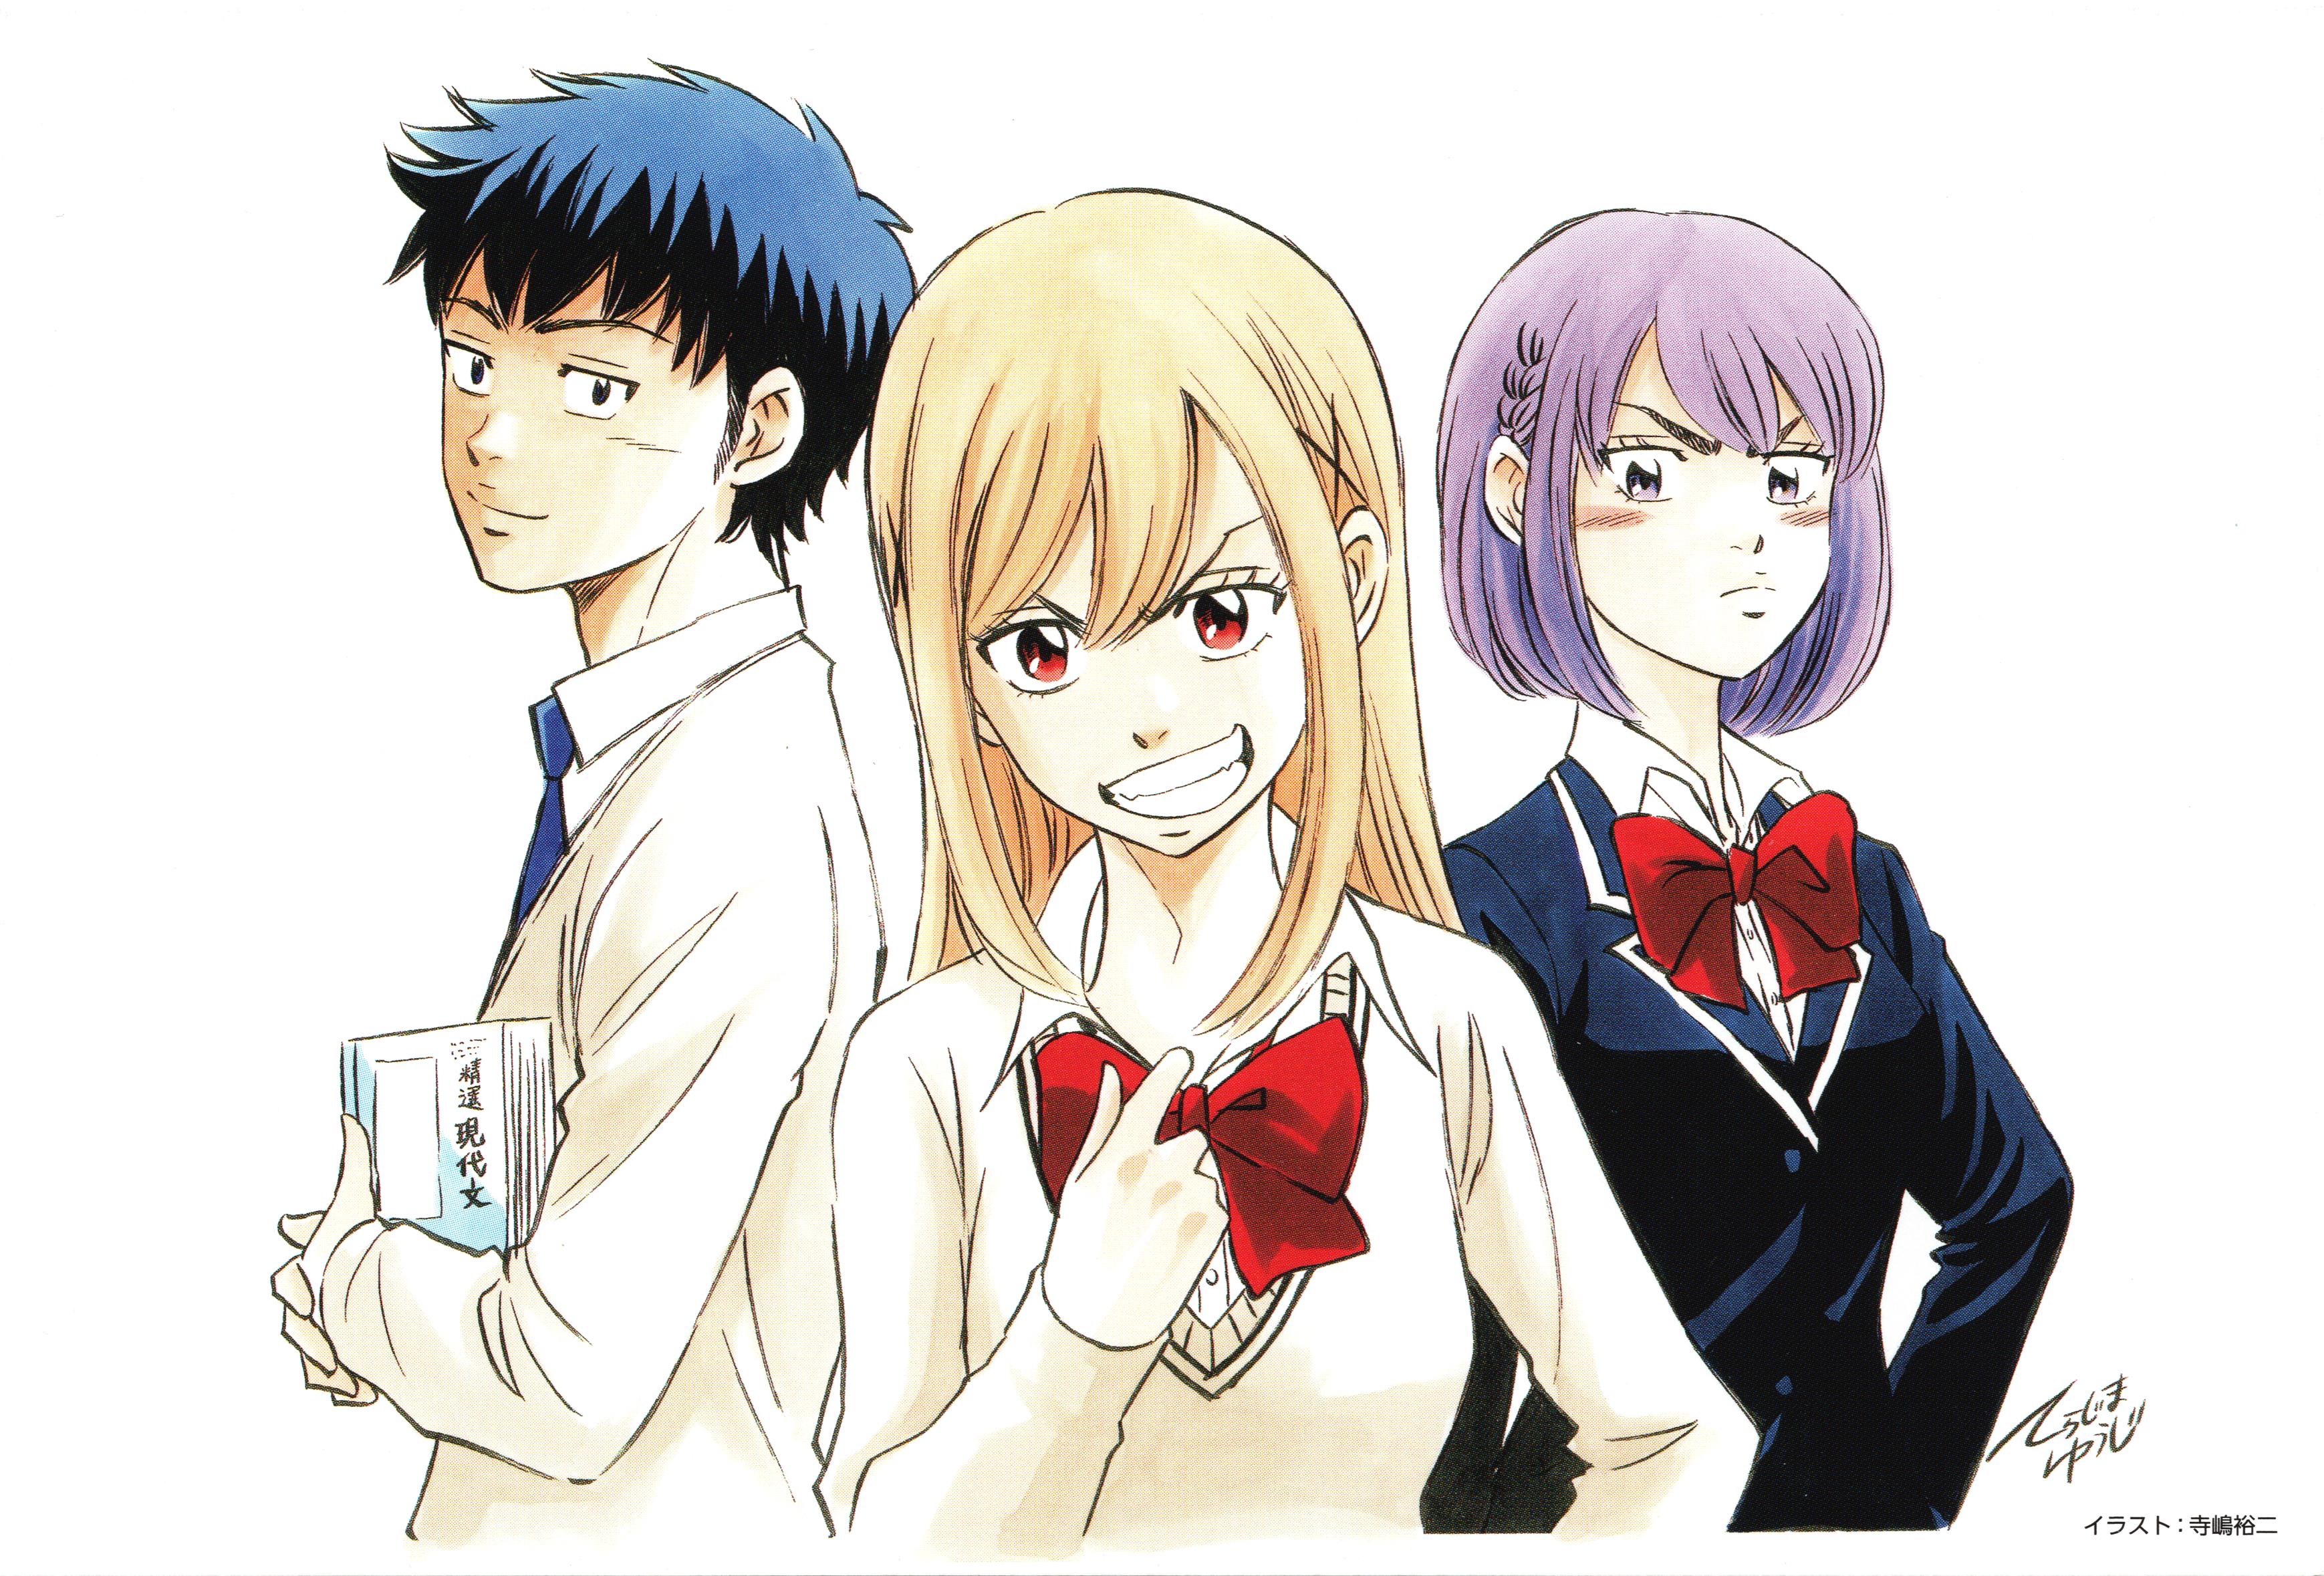 Odagiri Nene Yamada Kun To 7 Nin No Majo Zerochan Anime Image